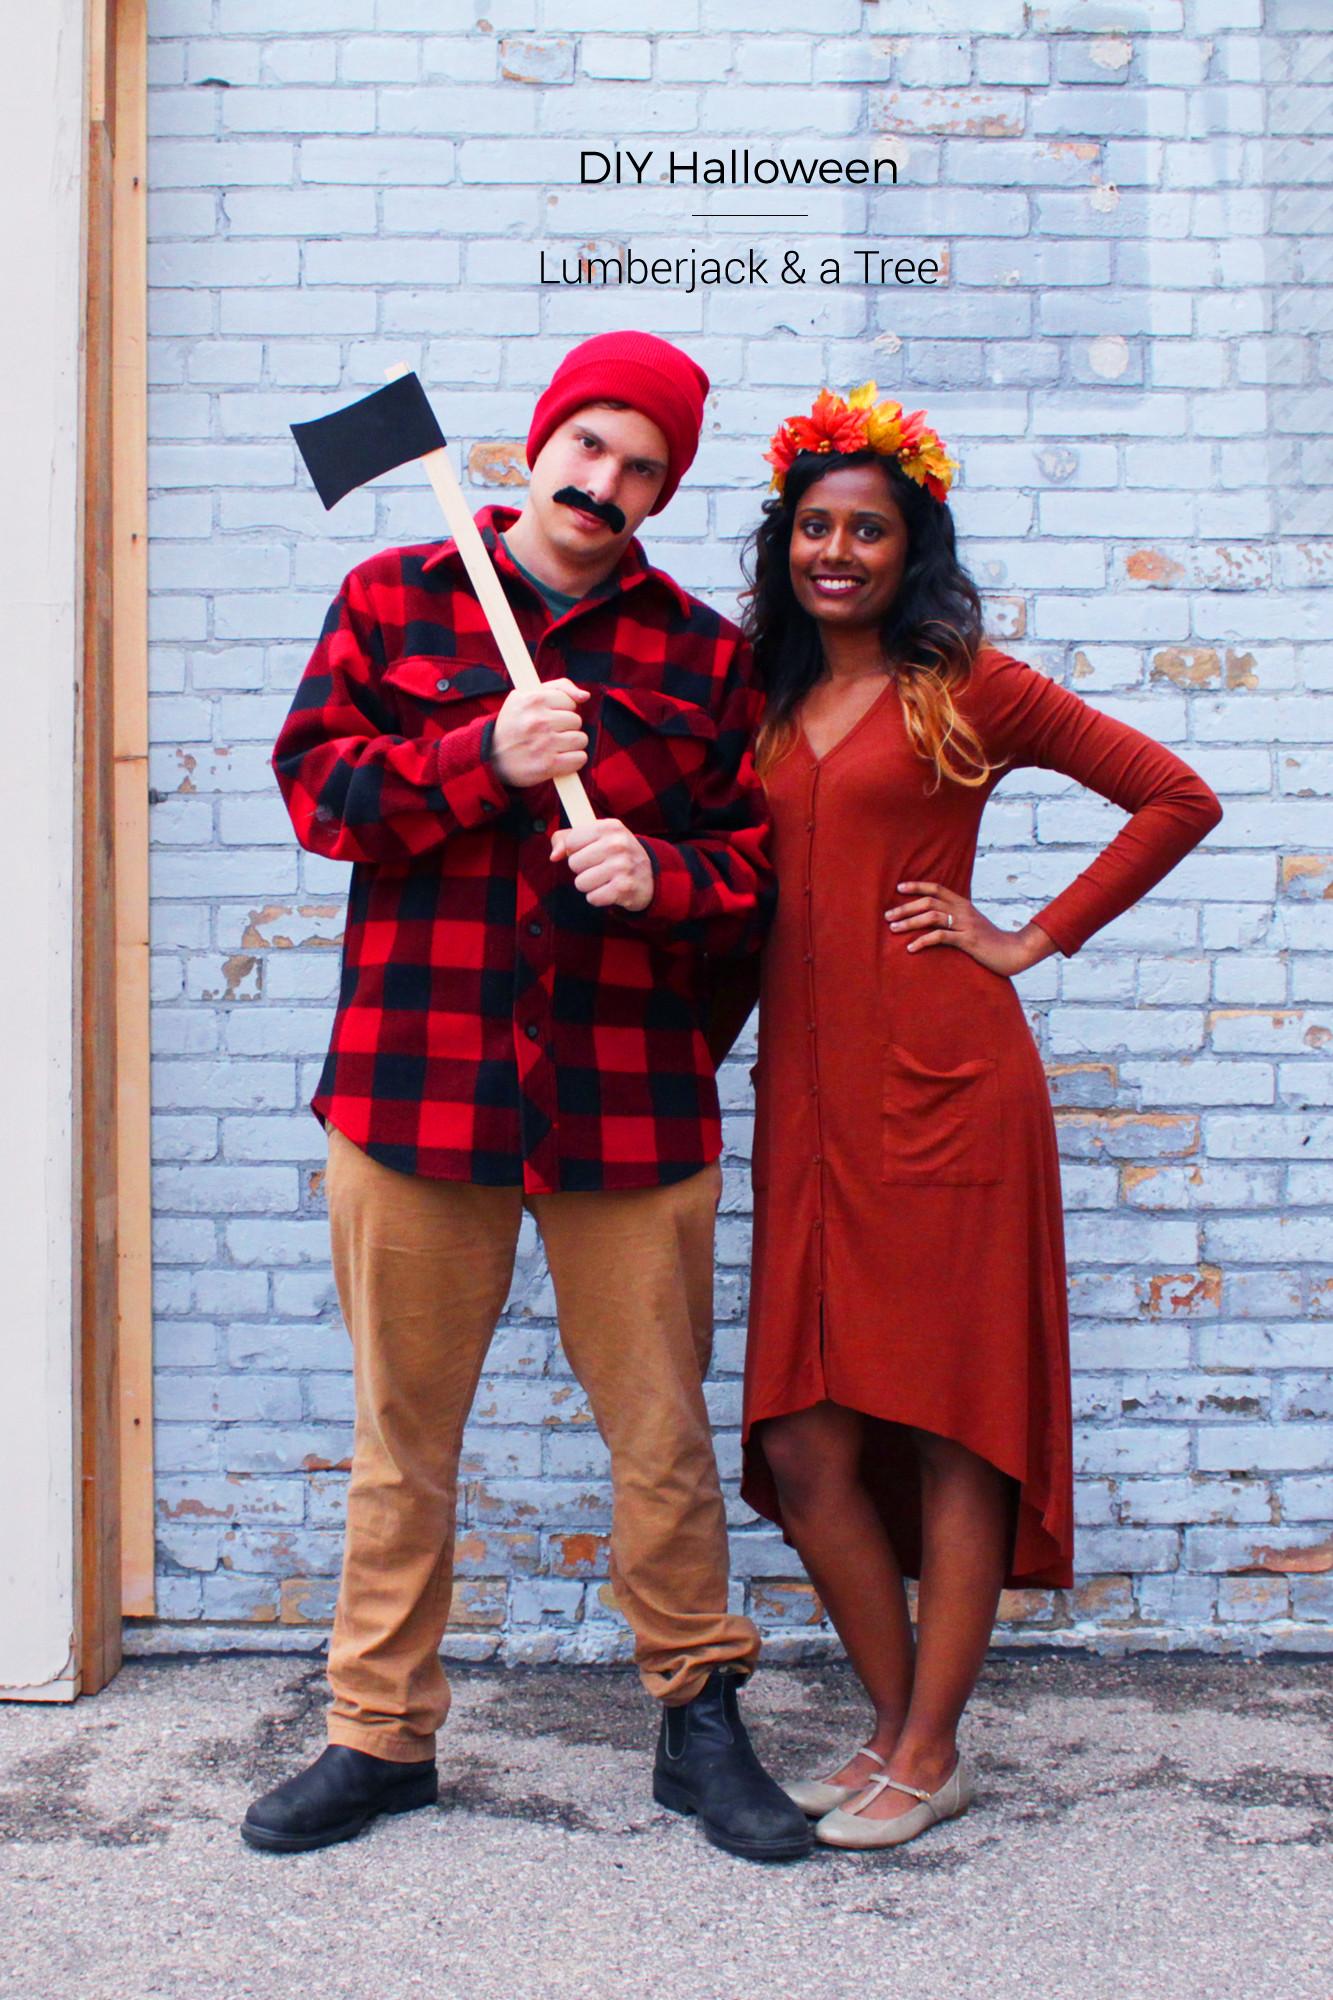 DIY Halloween Costumes  DIY Halloween Couples Costume Lumberjack & a Tree